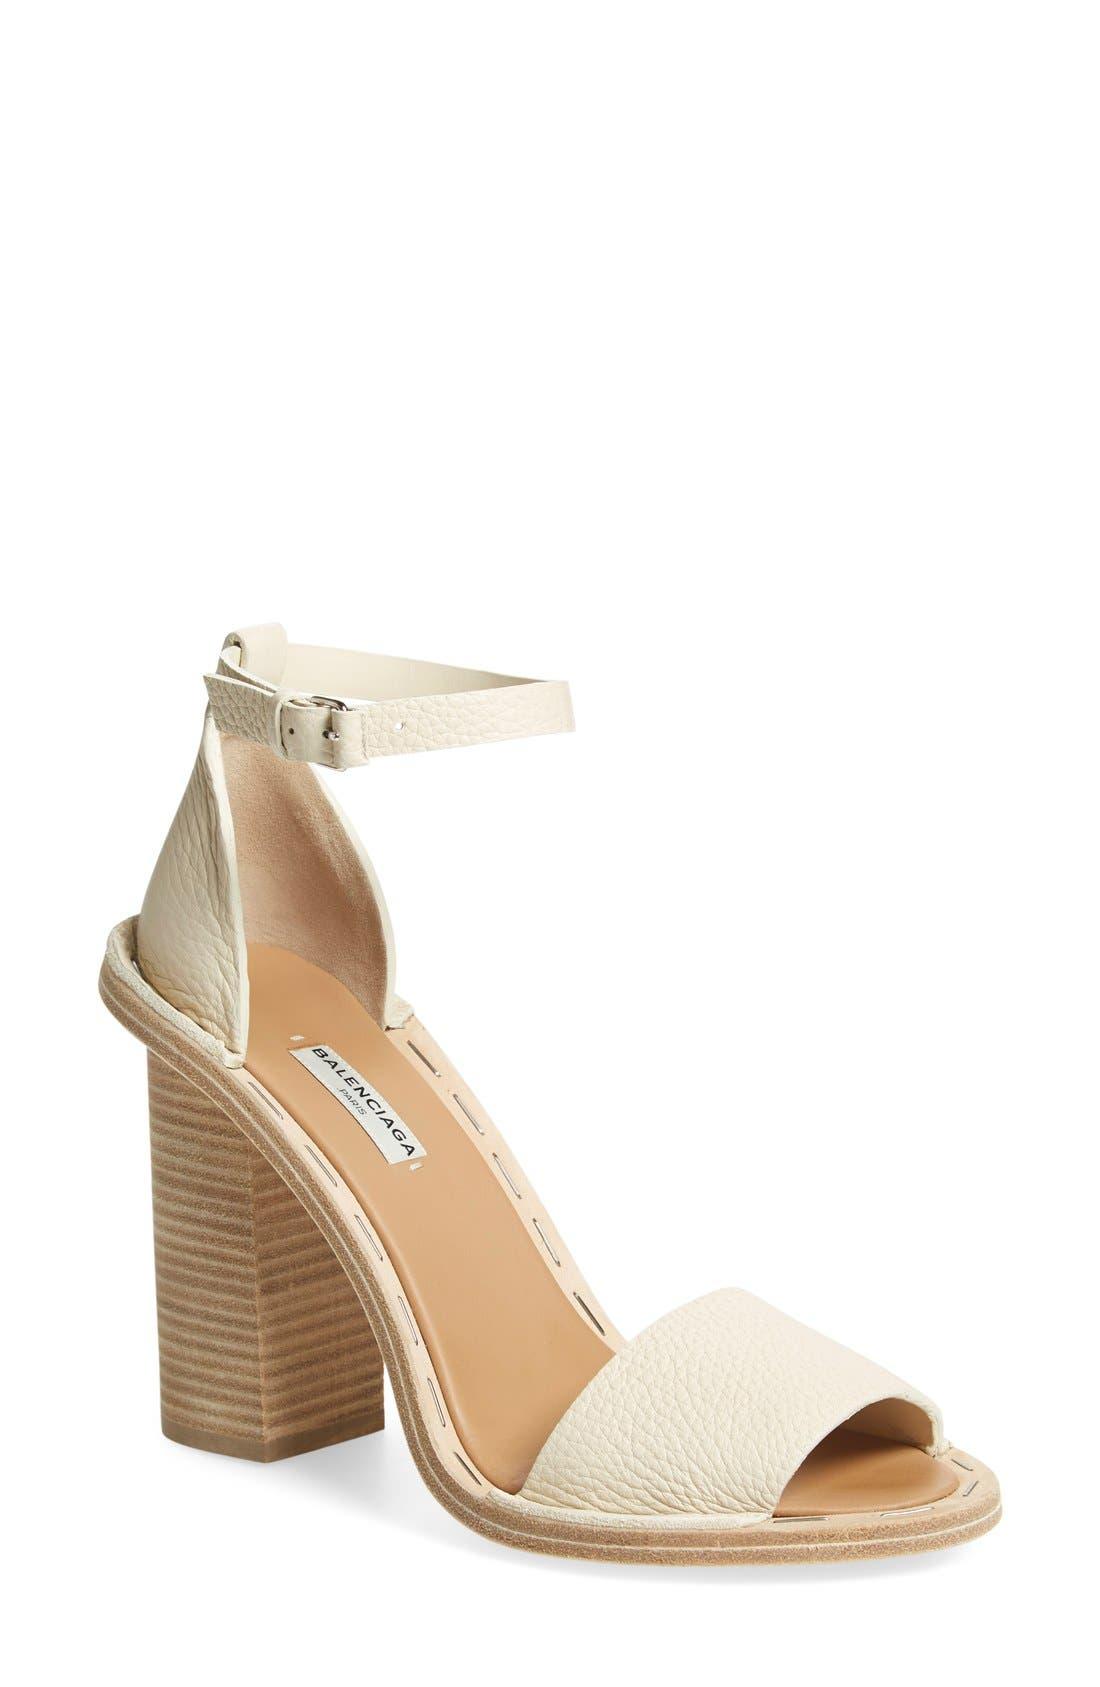 Alternate Image 1 Selected - Balenciaga Wood Heel Sandal (Women)